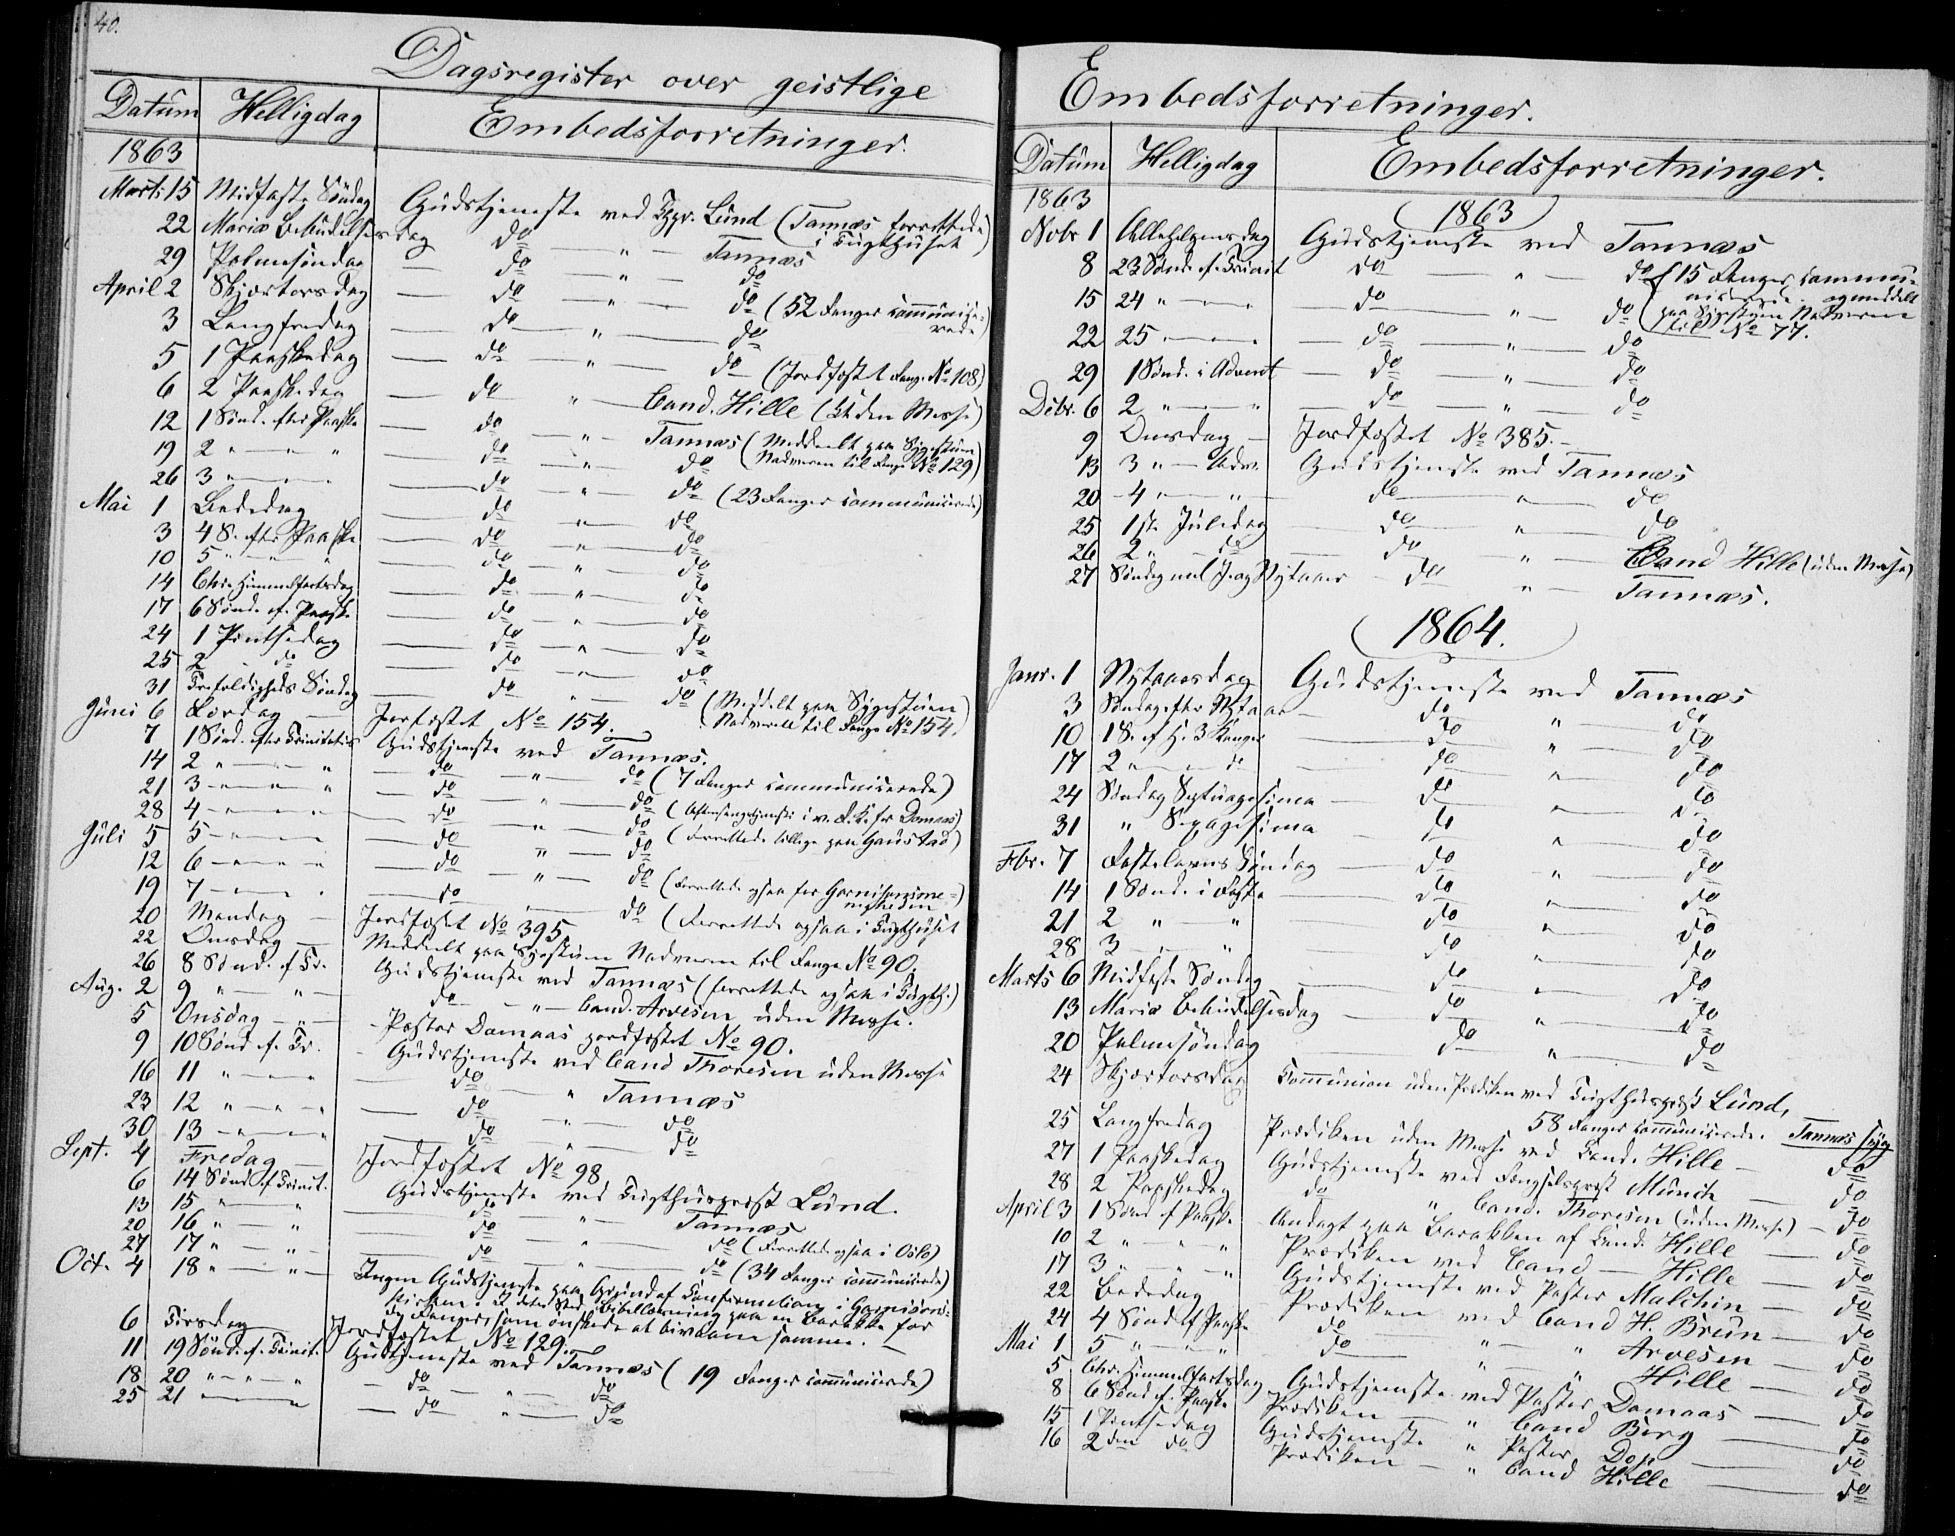 SAO, Akershus festnings slaveri Kirkebøker, F/Fa/L0002: Ministerialbok nr. 2, 1852-1883, s. 40